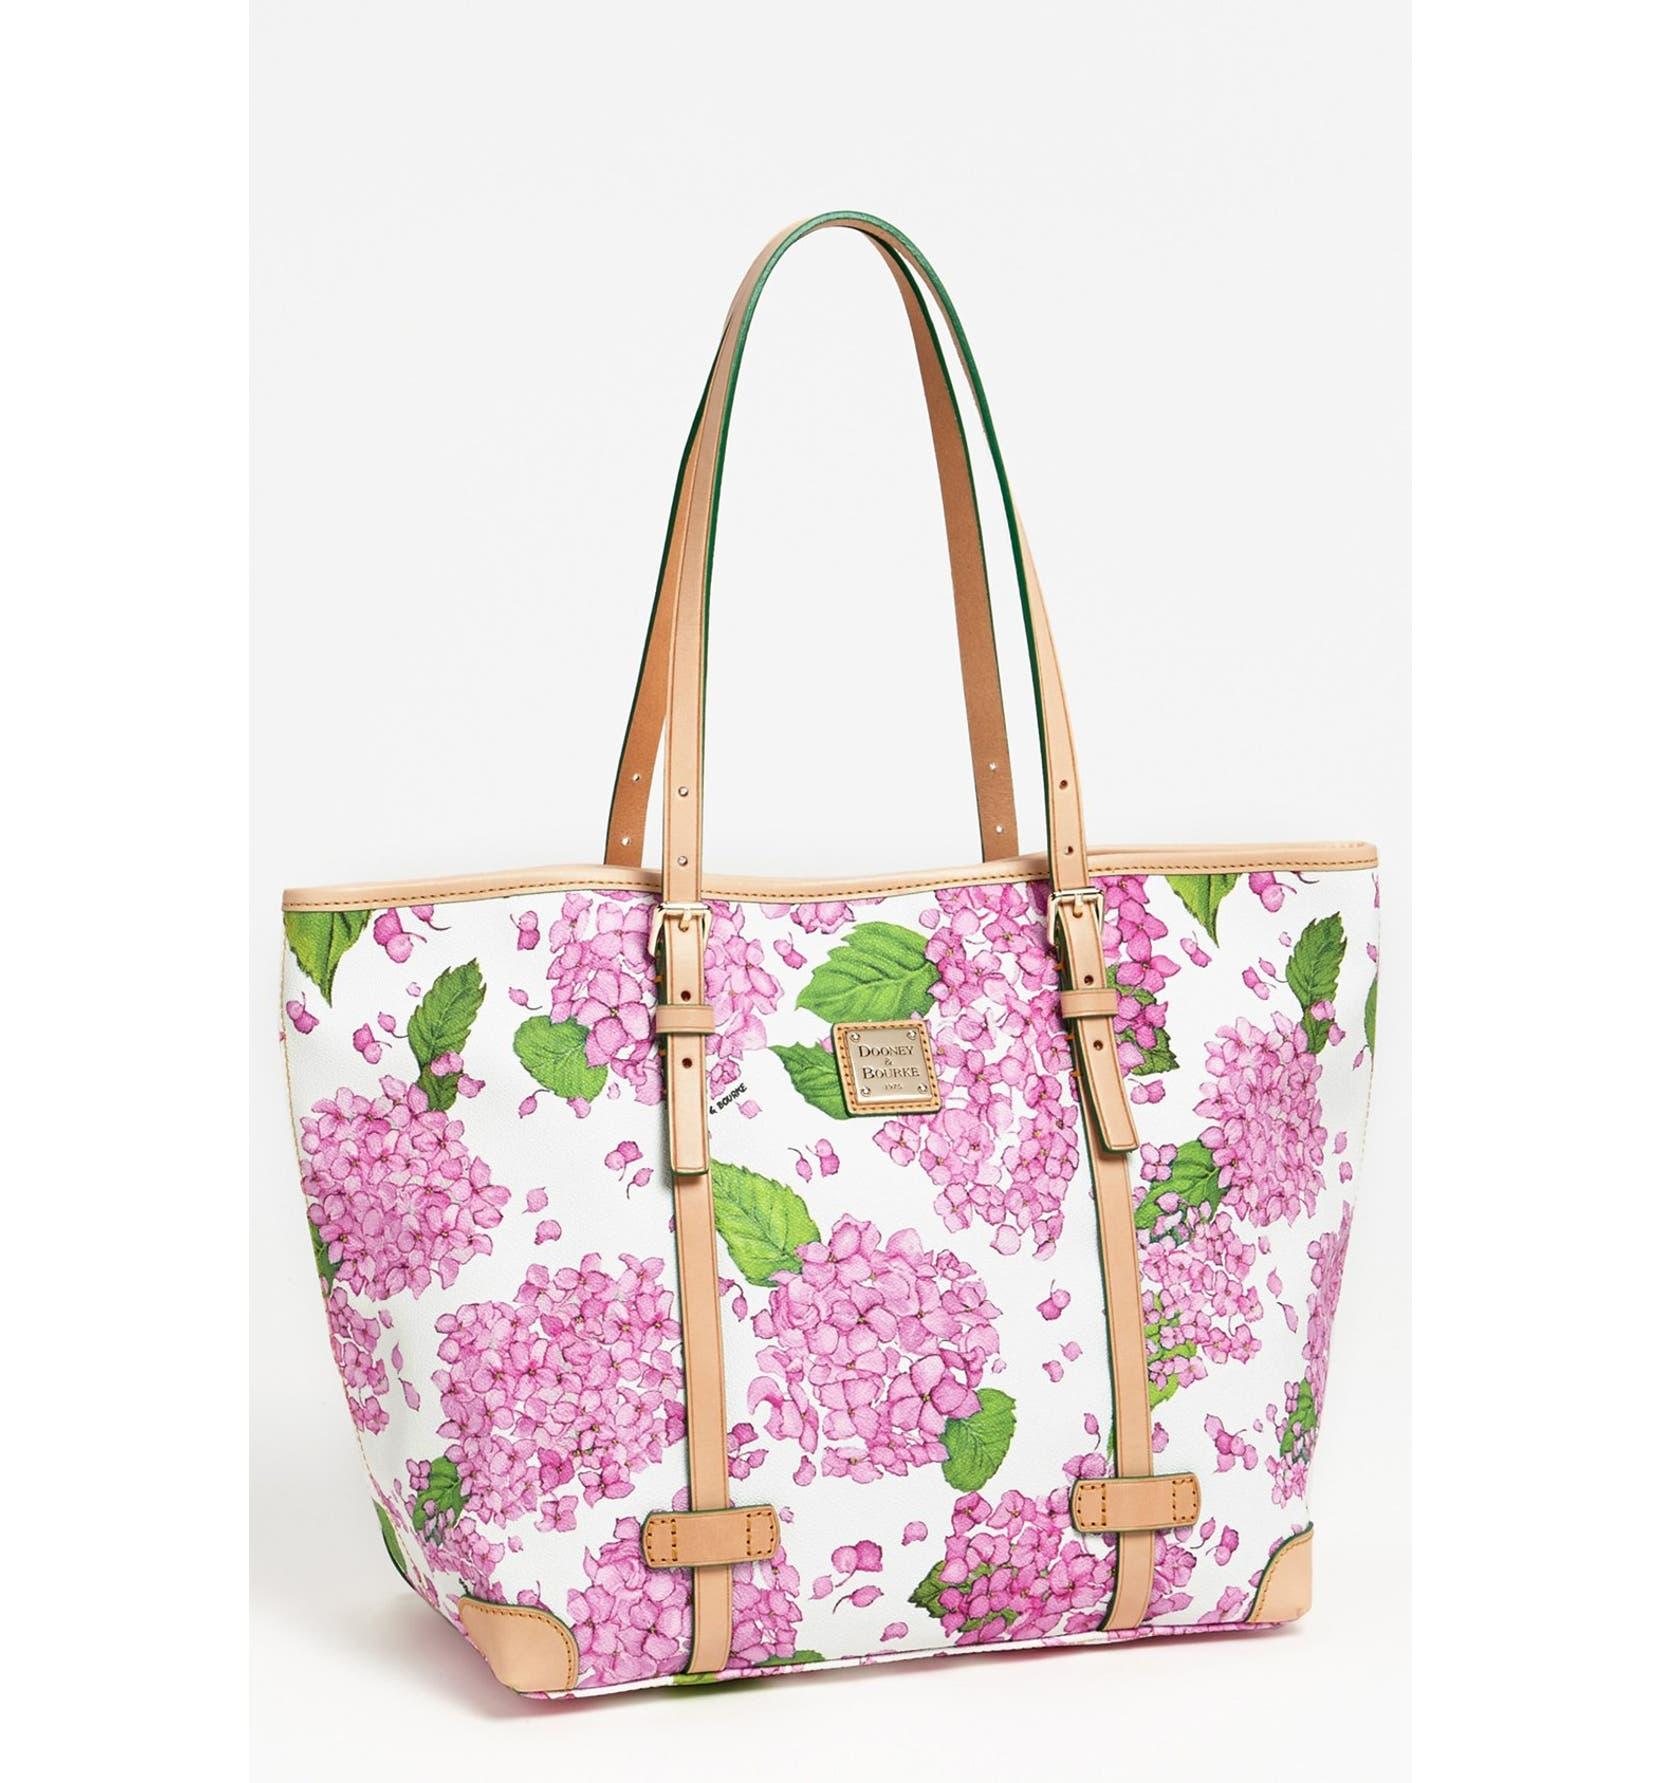 Dooney & Bourke \'Hydrangea\' Shopper, Extra Large | Nordstrom